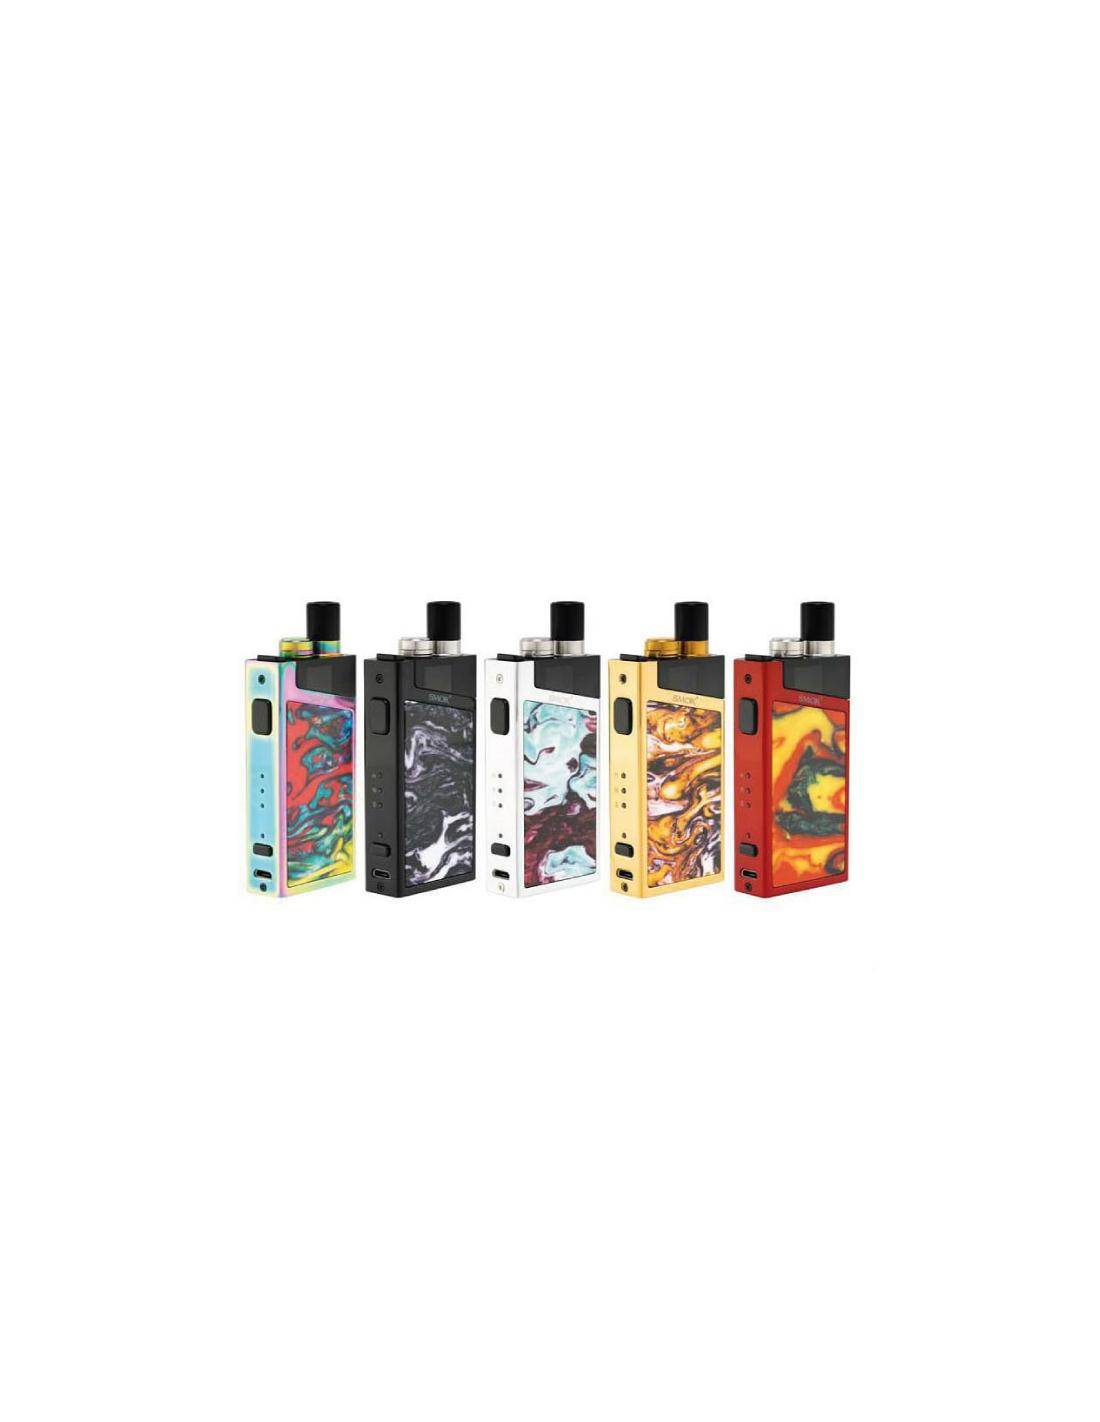 Smok Trinity Alpha Starter Kit Aio Sigaretta Elettronica